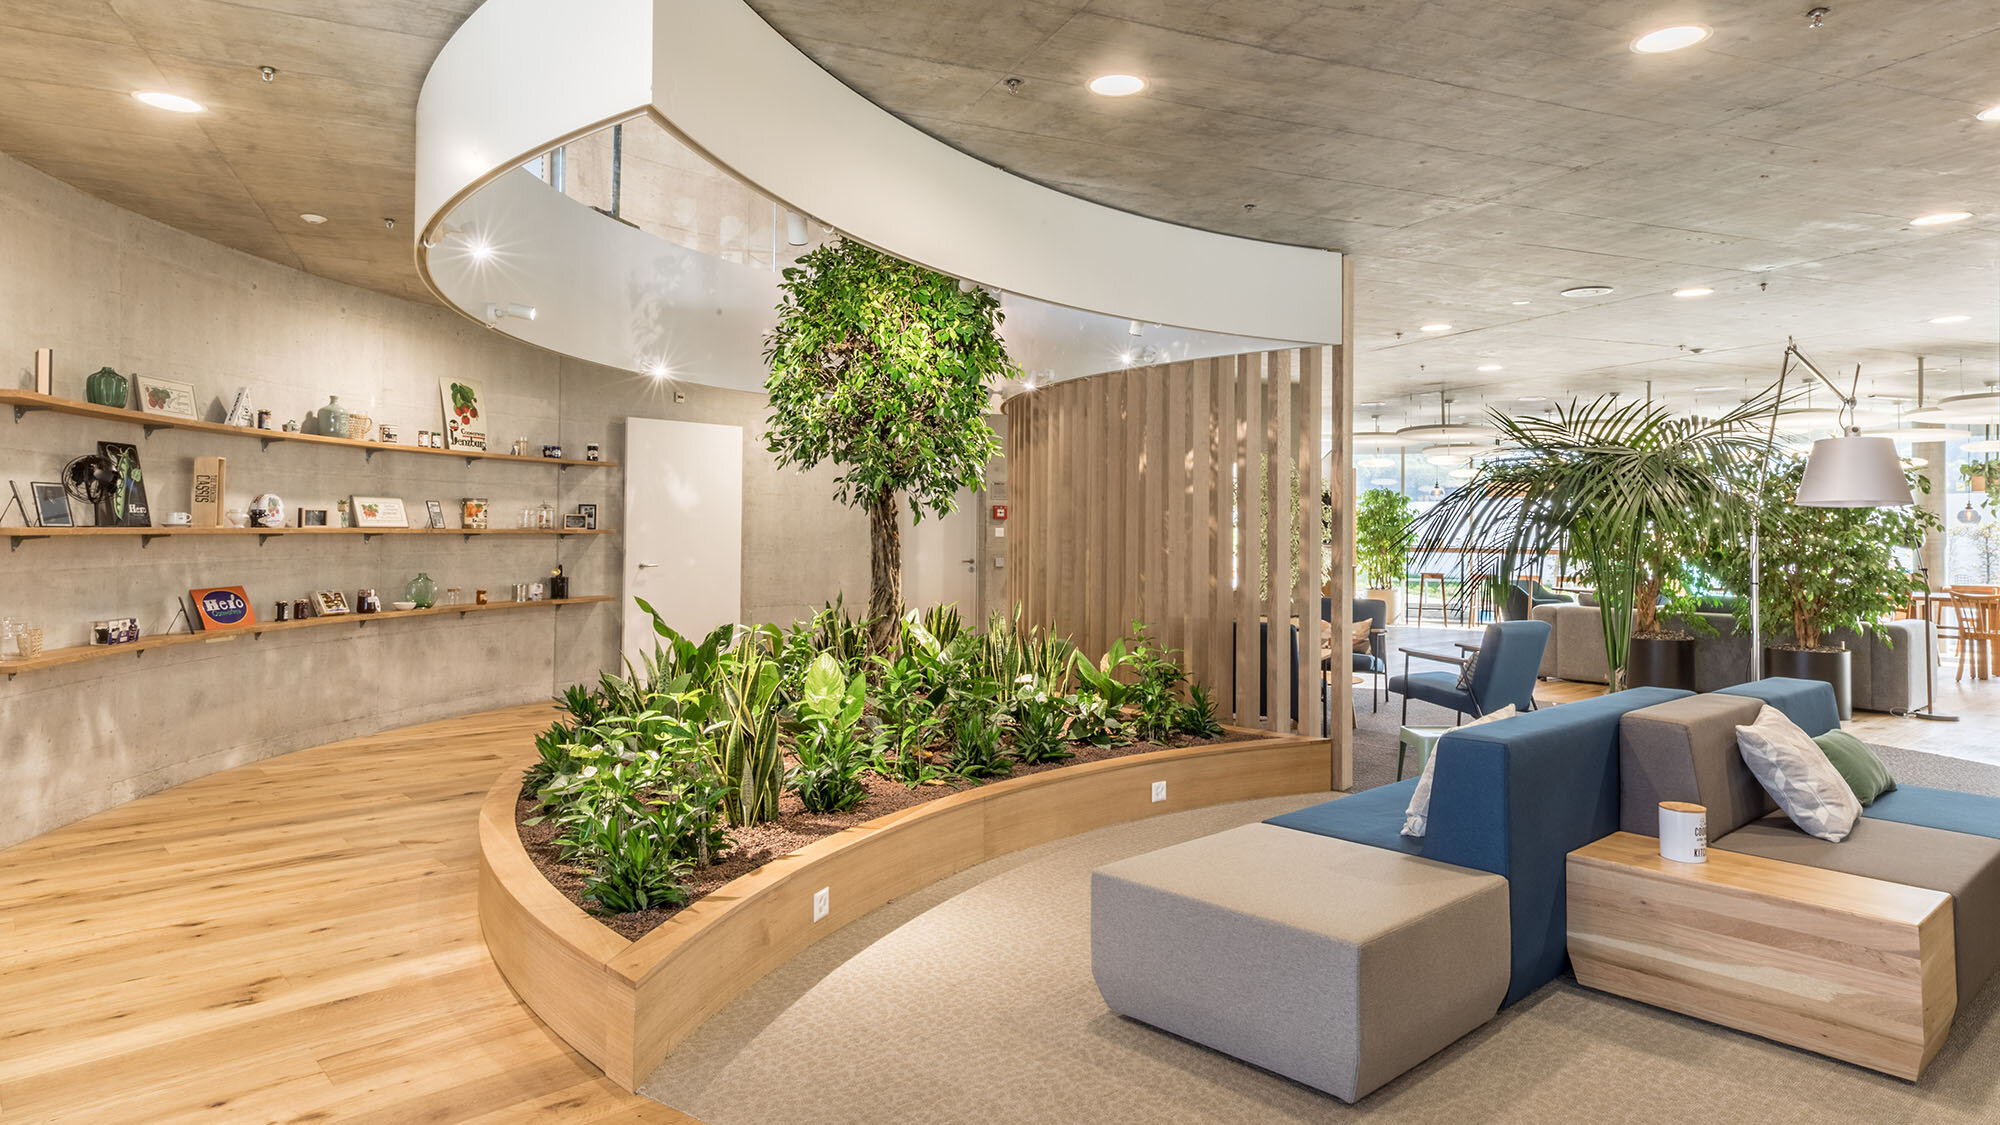 Biophilic design - interiors & buildings - principles ...